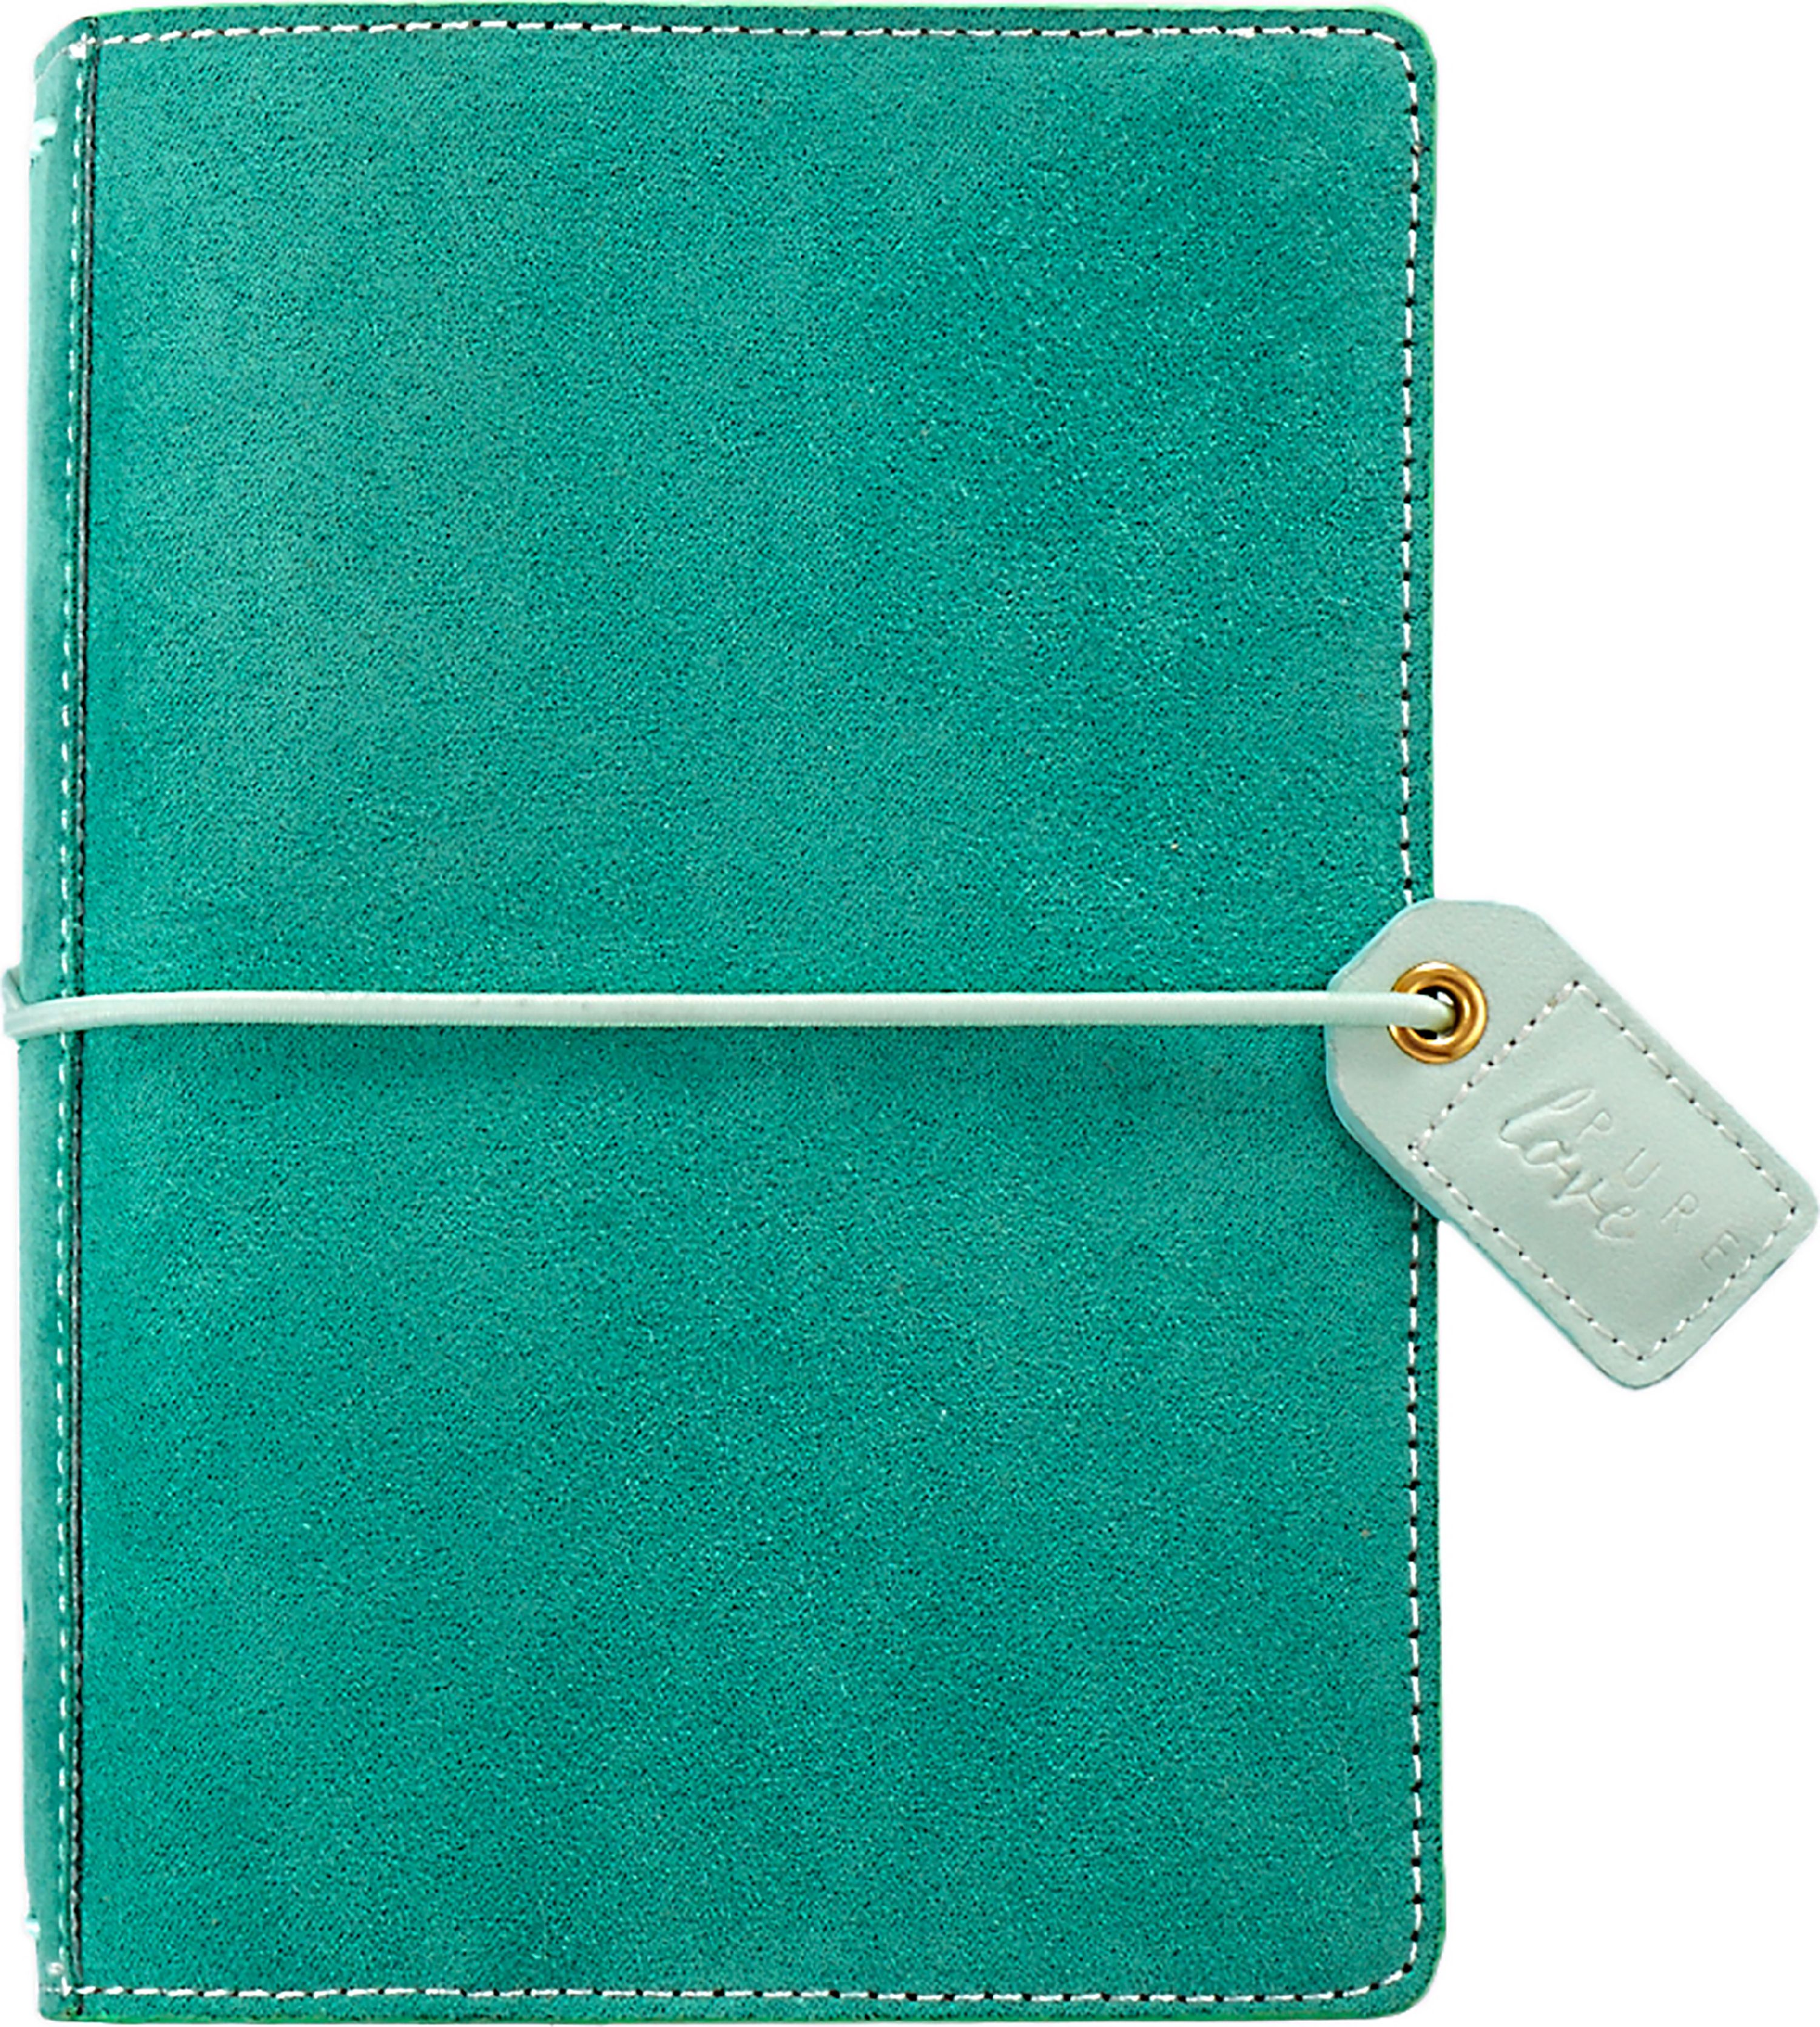 "Color Crush Pocket Traveler's Planner 4.25""X6""-Aspen Green Suede"